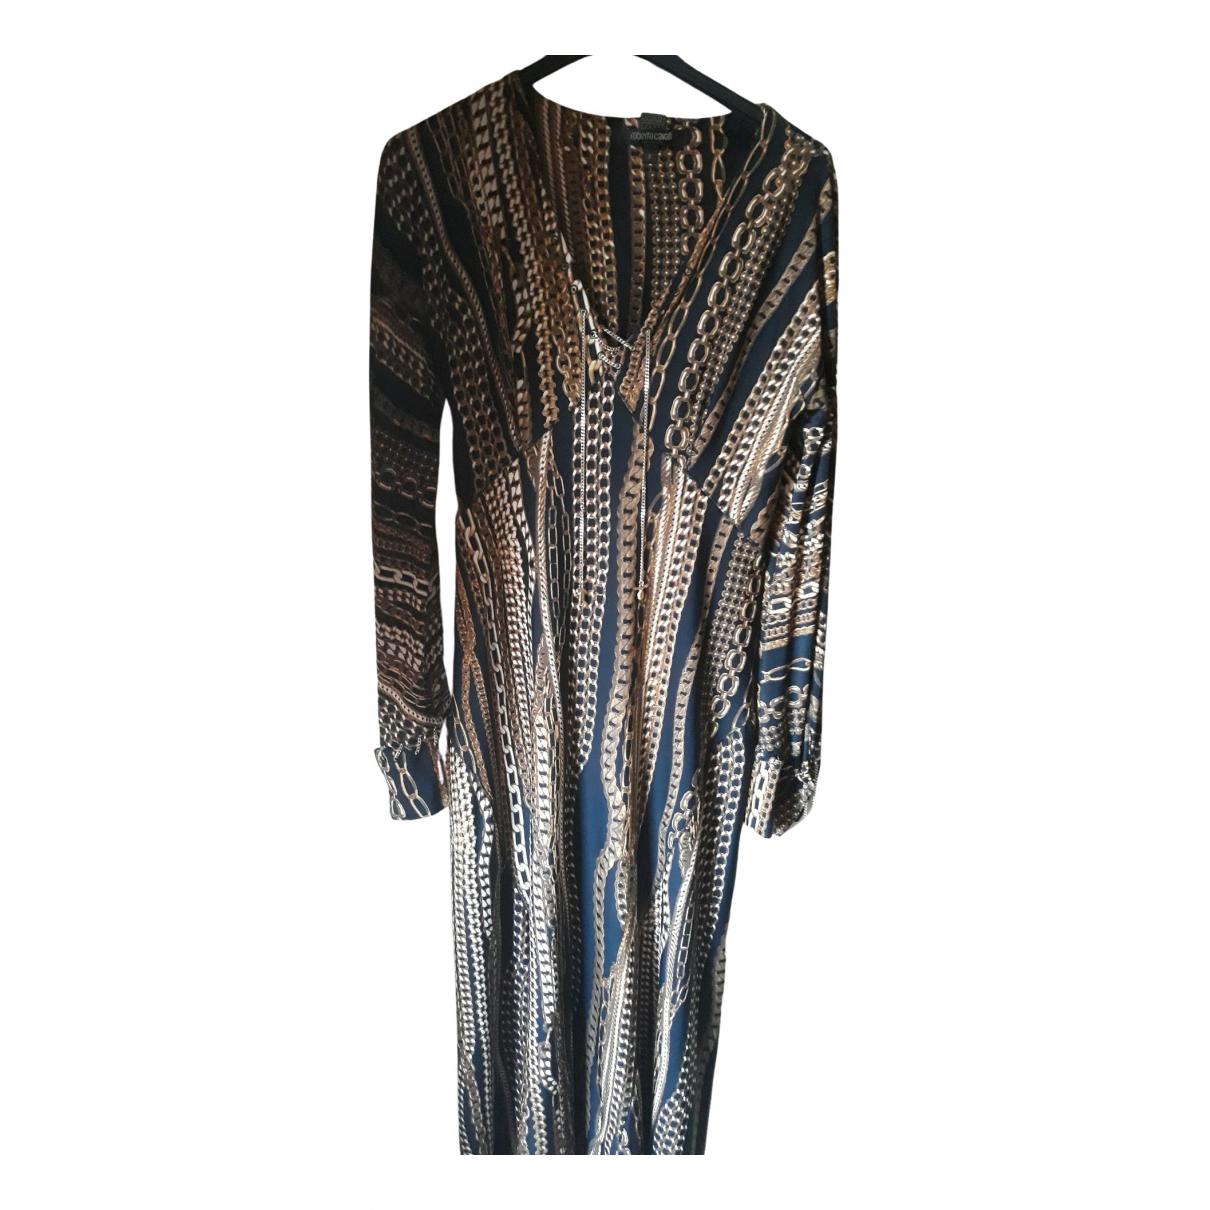 Roberto Cavalli \N dress for Women 42 IT